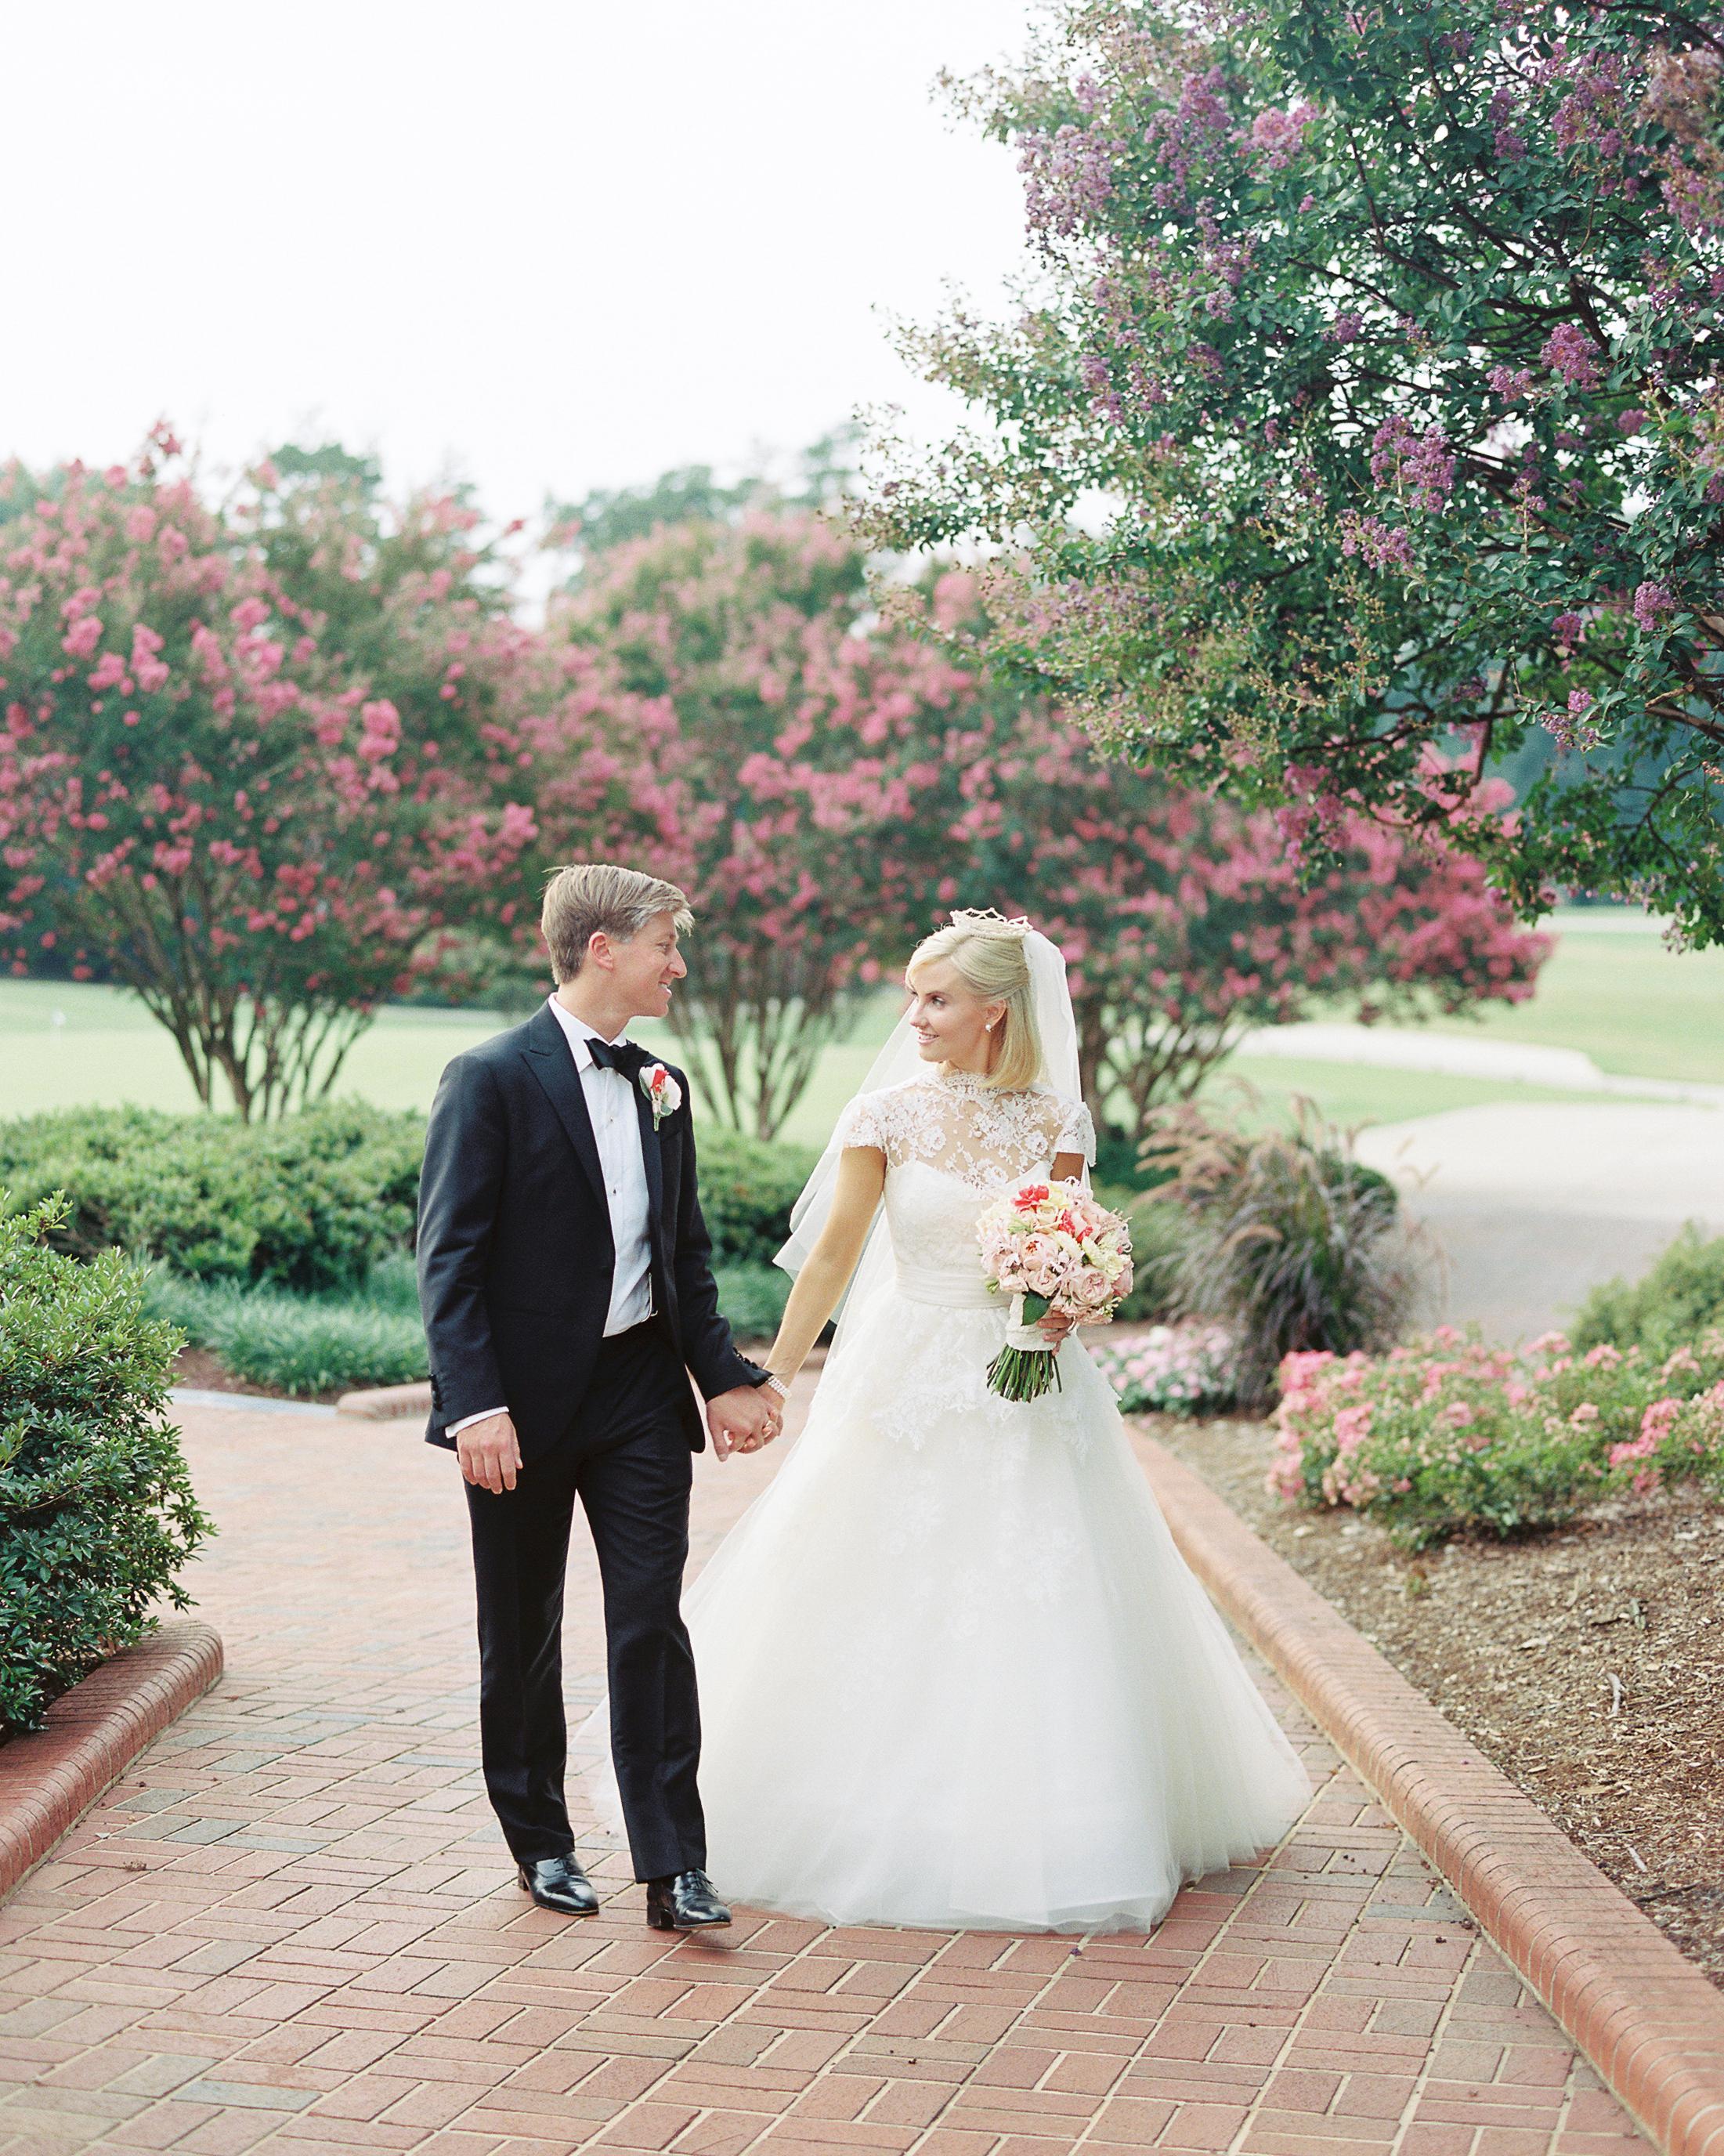 molly-patrick-wedding-couple-3295-s111760-0115.jpg